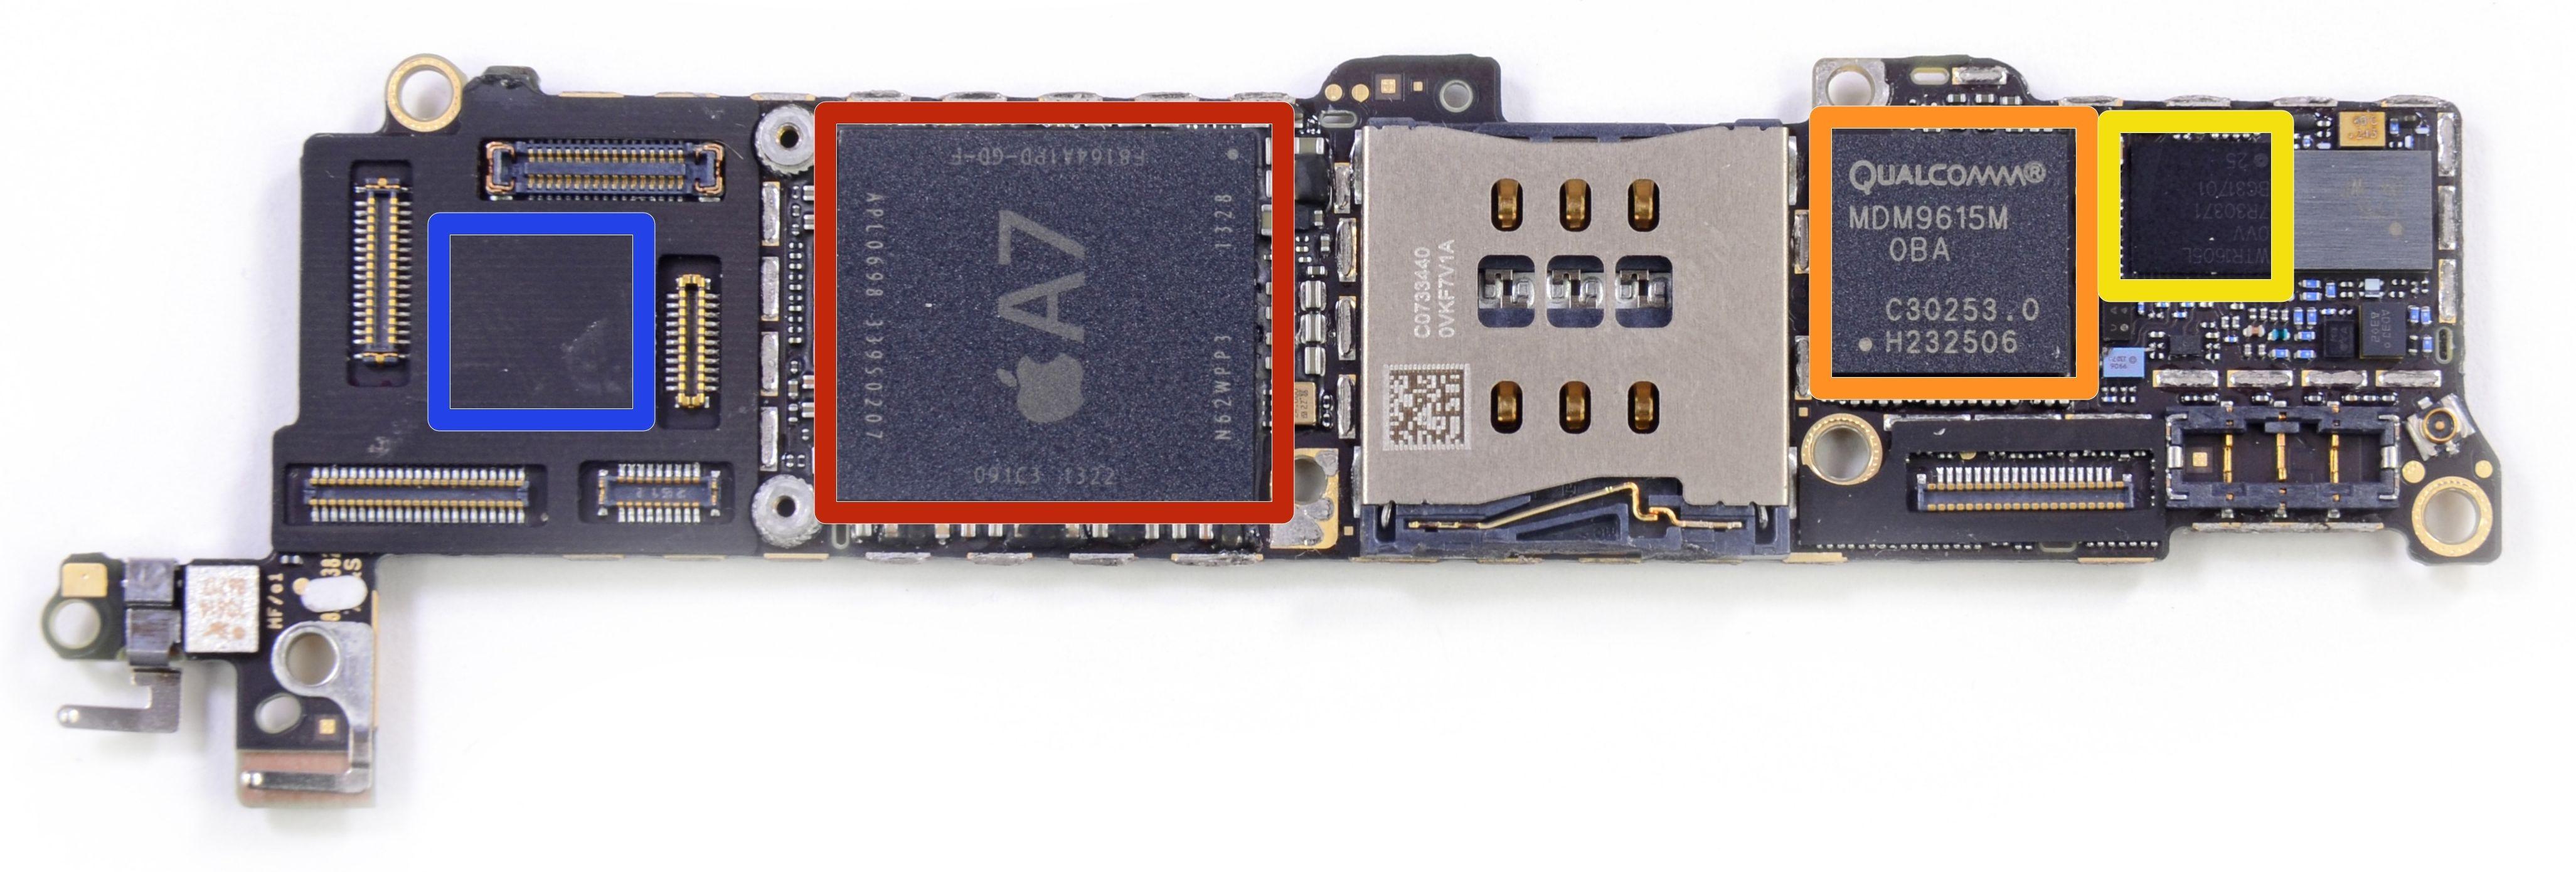 iPhone 5S teardown (iFixIt, Qualcomm baseband modem)